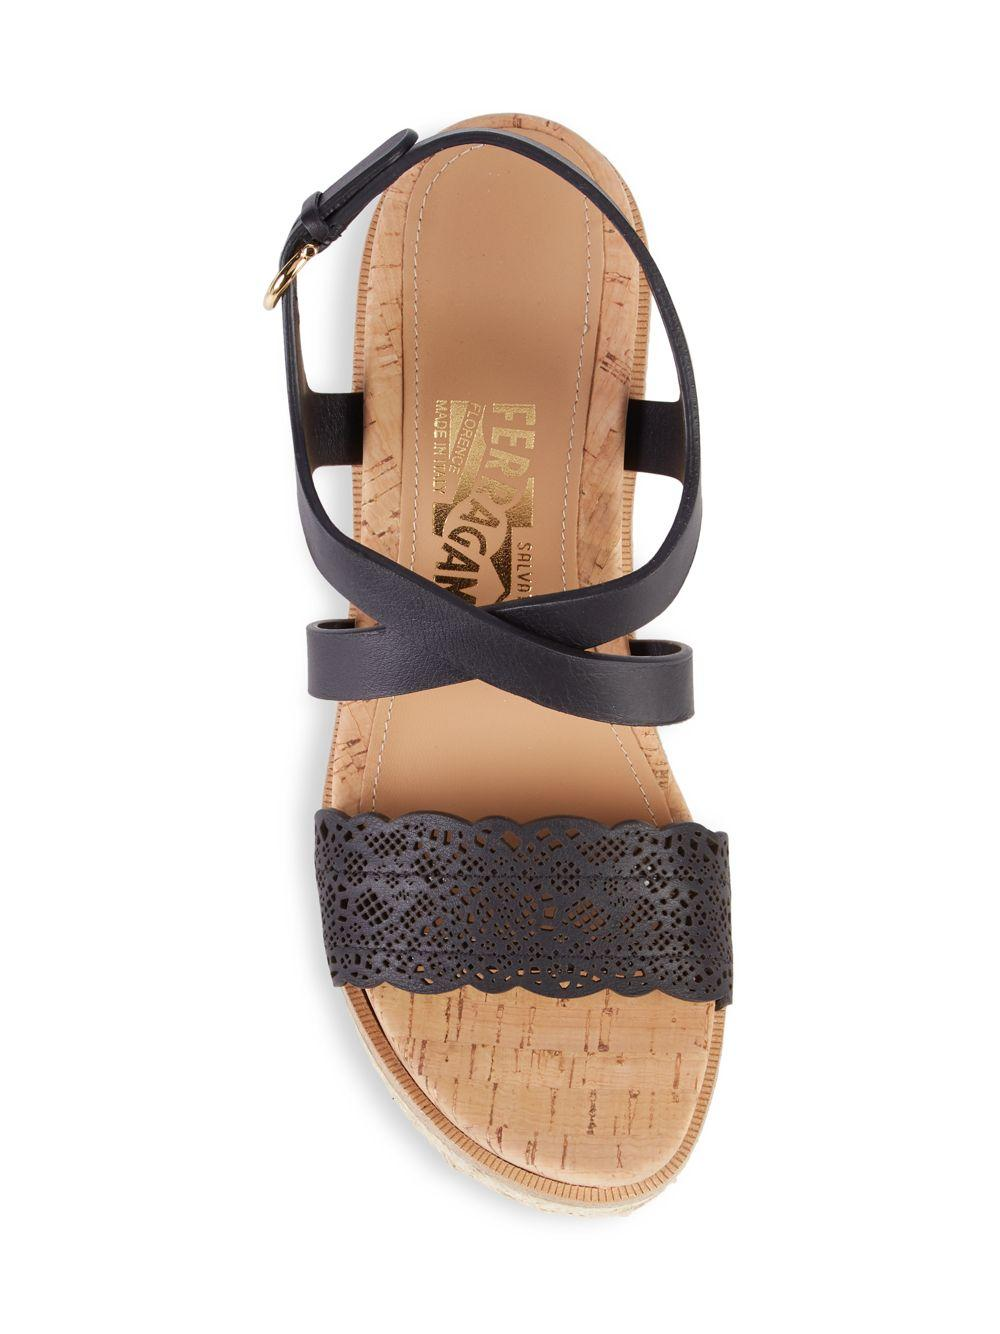 d220cff3382 Ferragamo Gioela Lasercut Wedge Sandals in Black - Lyst